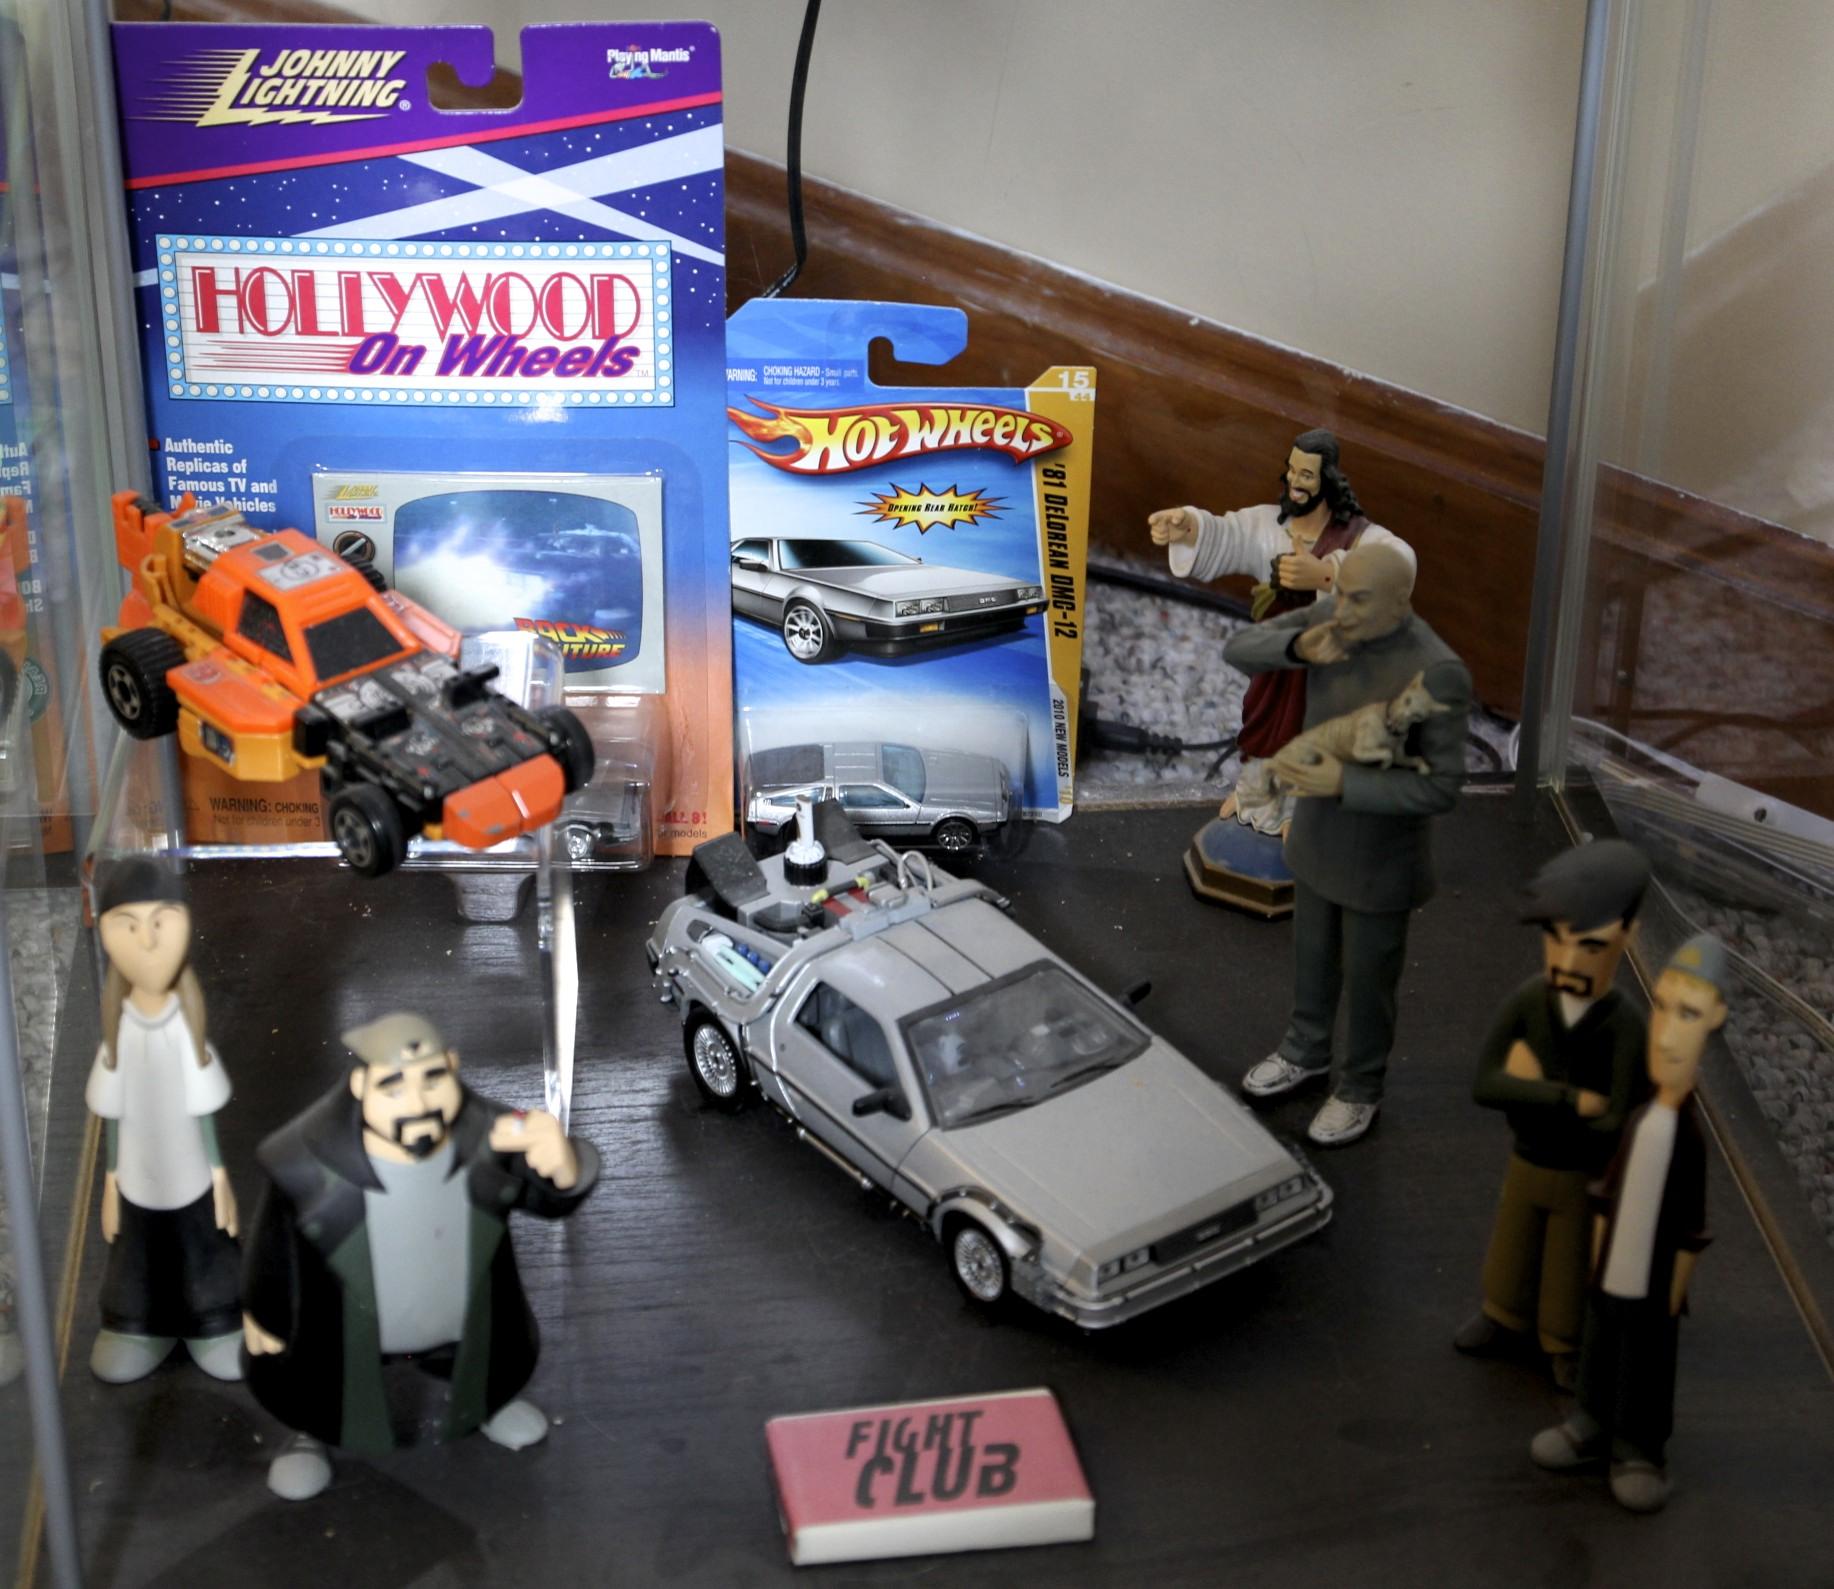 Sandstorm, Time Machine, DeLoreans,  Dogma  Buddy Christ,  Austin Powers  Dr. Evil,  Clerks  Figures,  Fight Club  Soap.